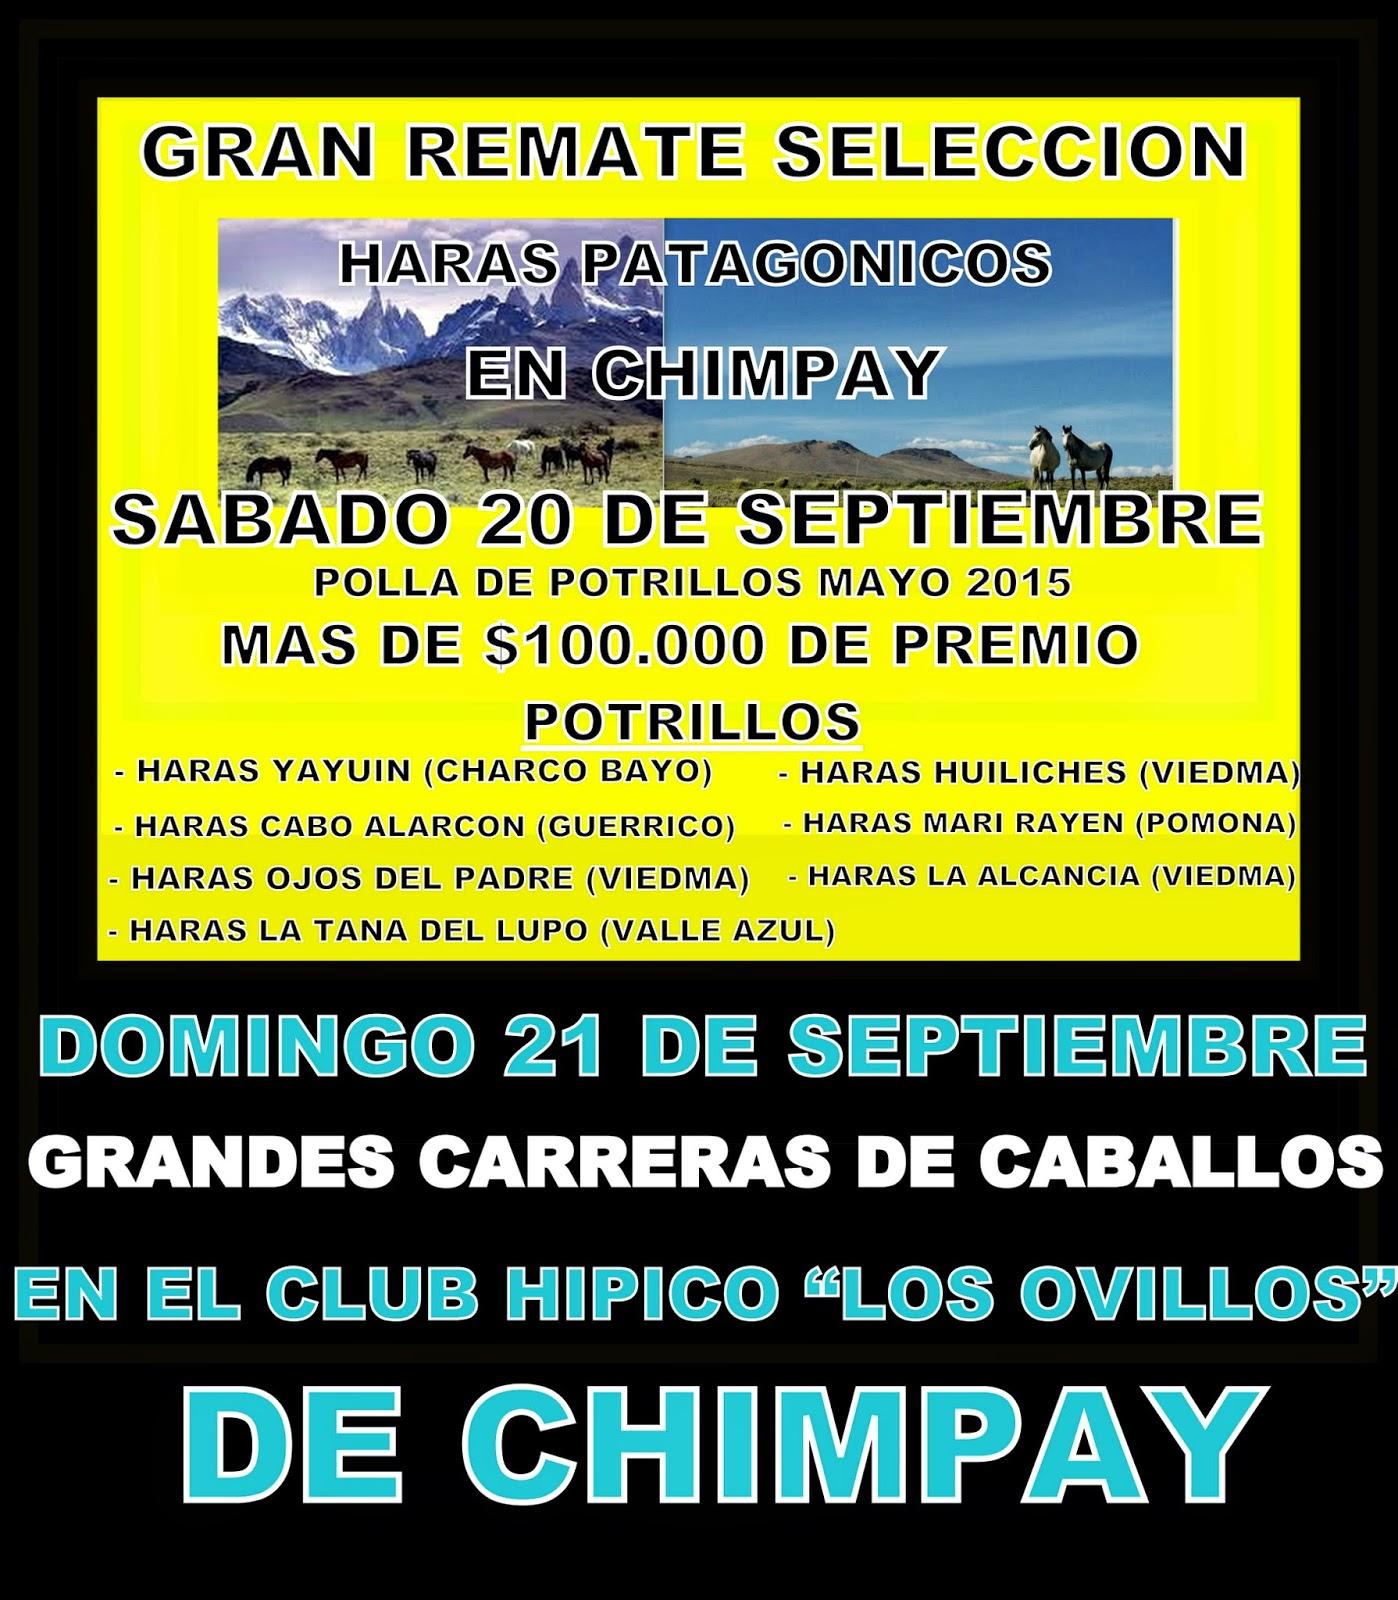 http://turfdelapatagonia.blogspot.com.ar/2014/09/2109-programa-de-carreras-de-caballos_18.html